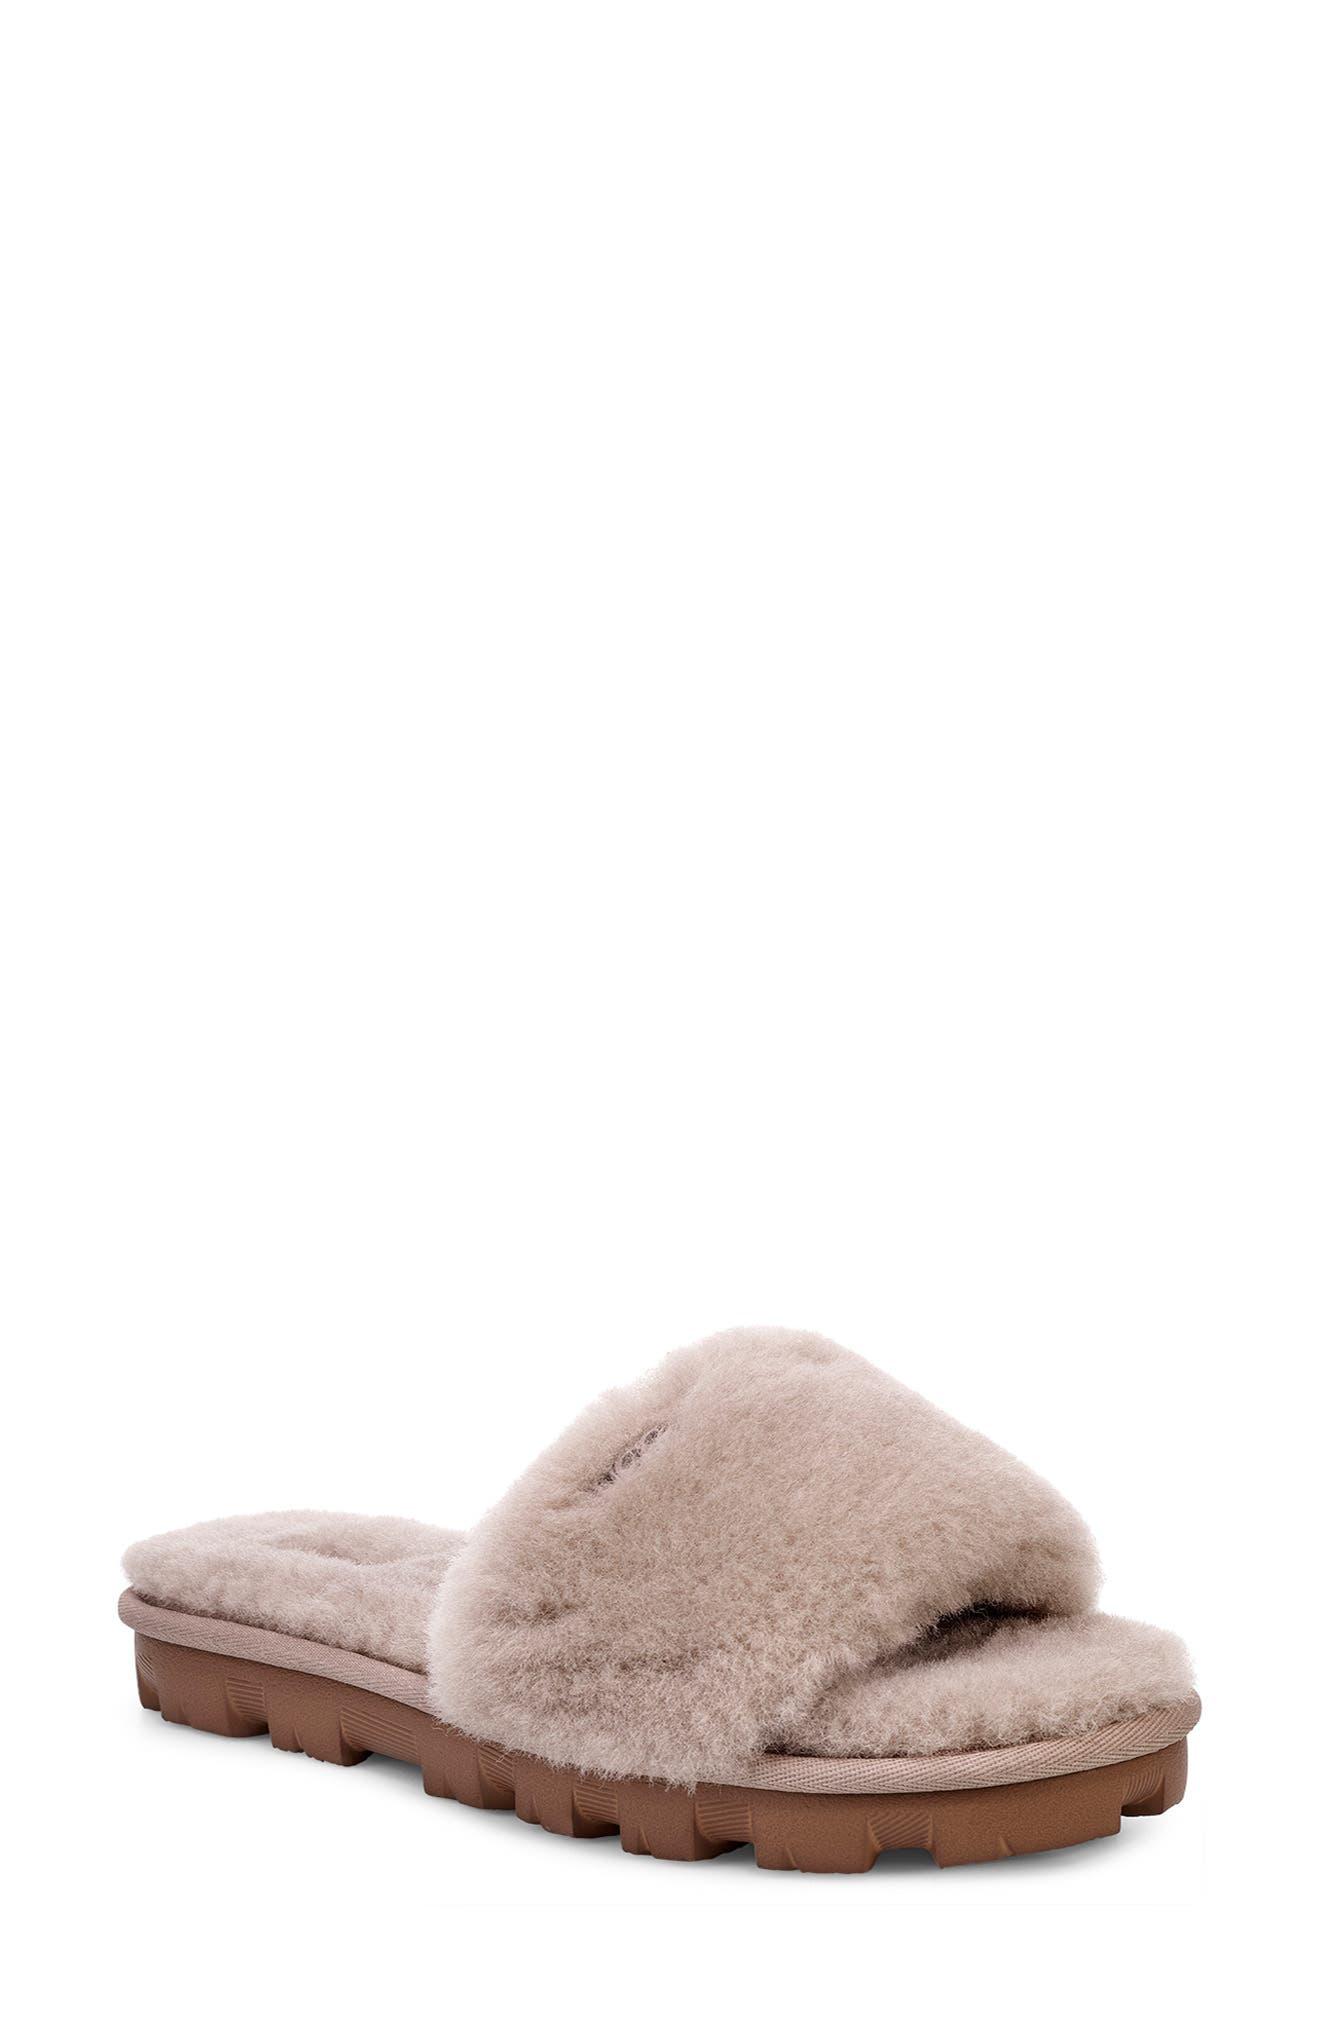 Ugg Cozette Genuine Shearling Slipper, Grey